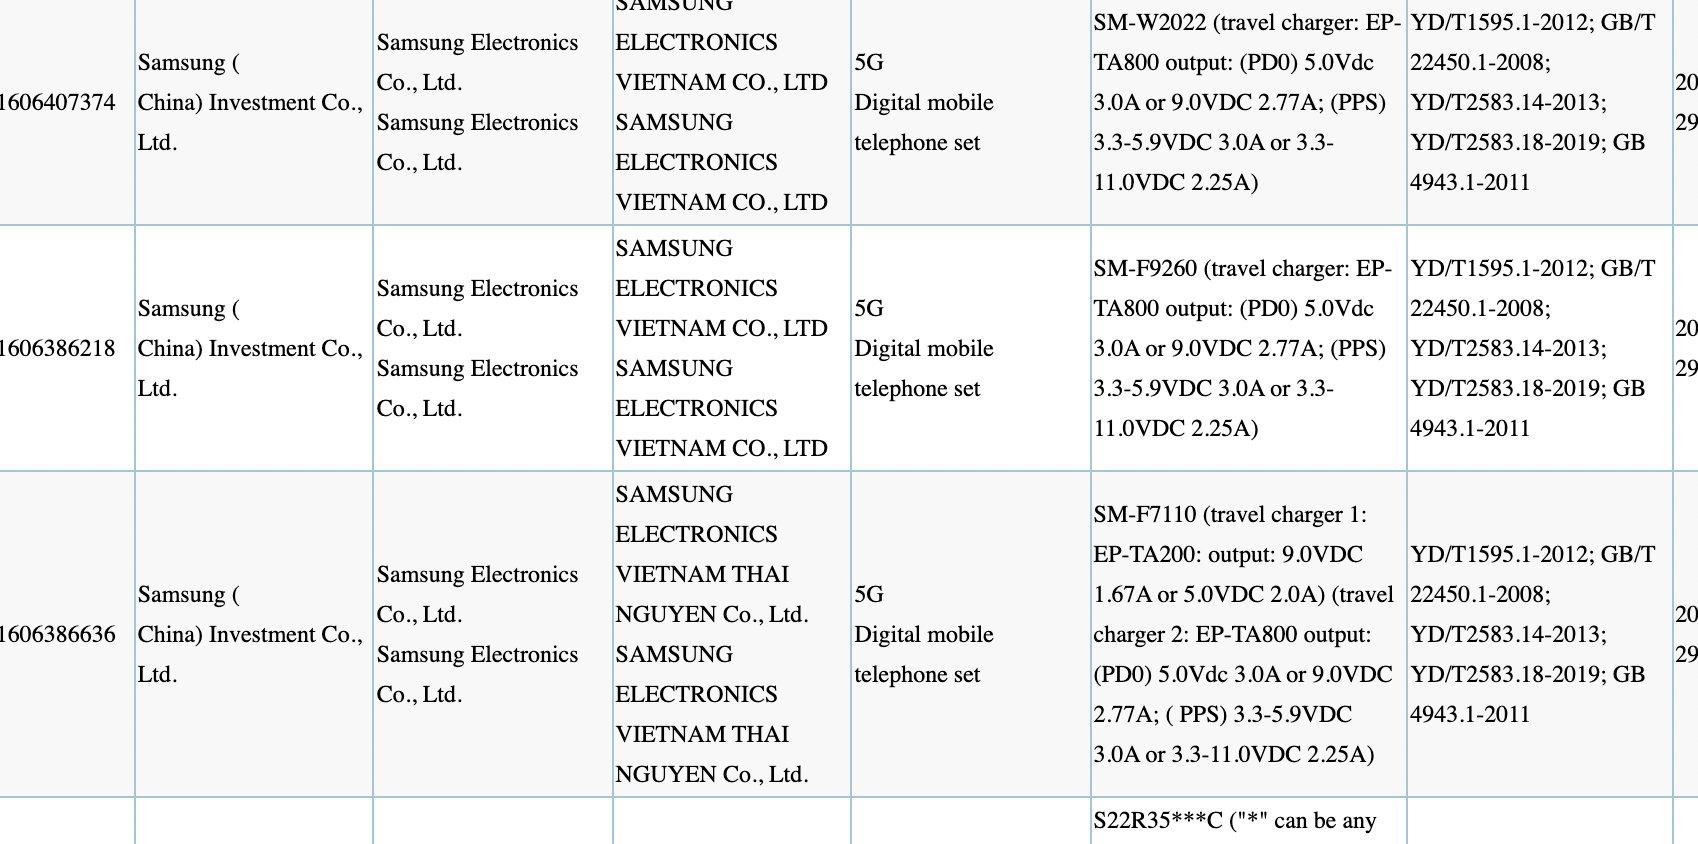 Samsung Galaxy Z Flip 3 - 3C Certification